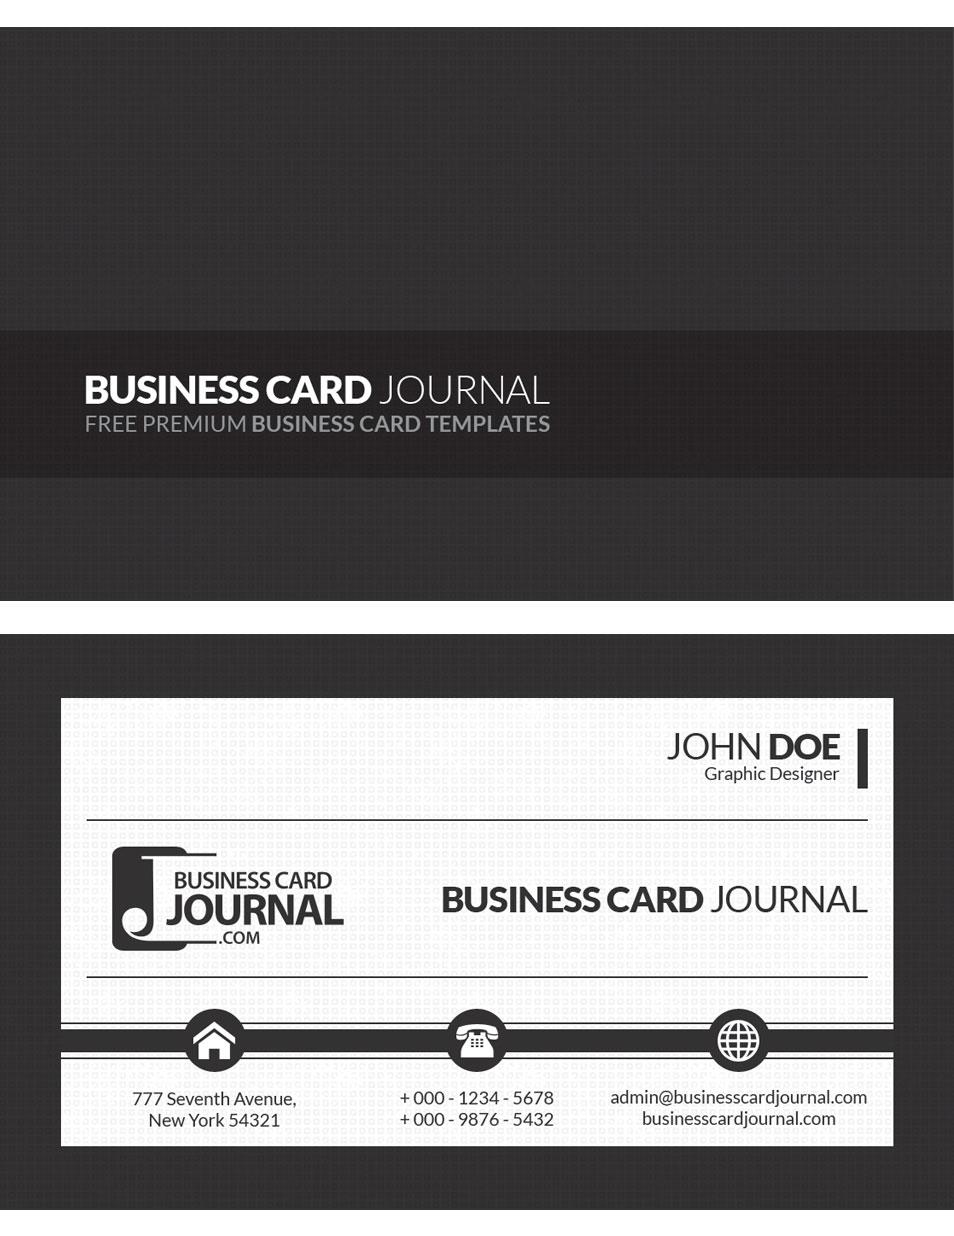 siyah-beyaz-kartvizit-tasarimlari